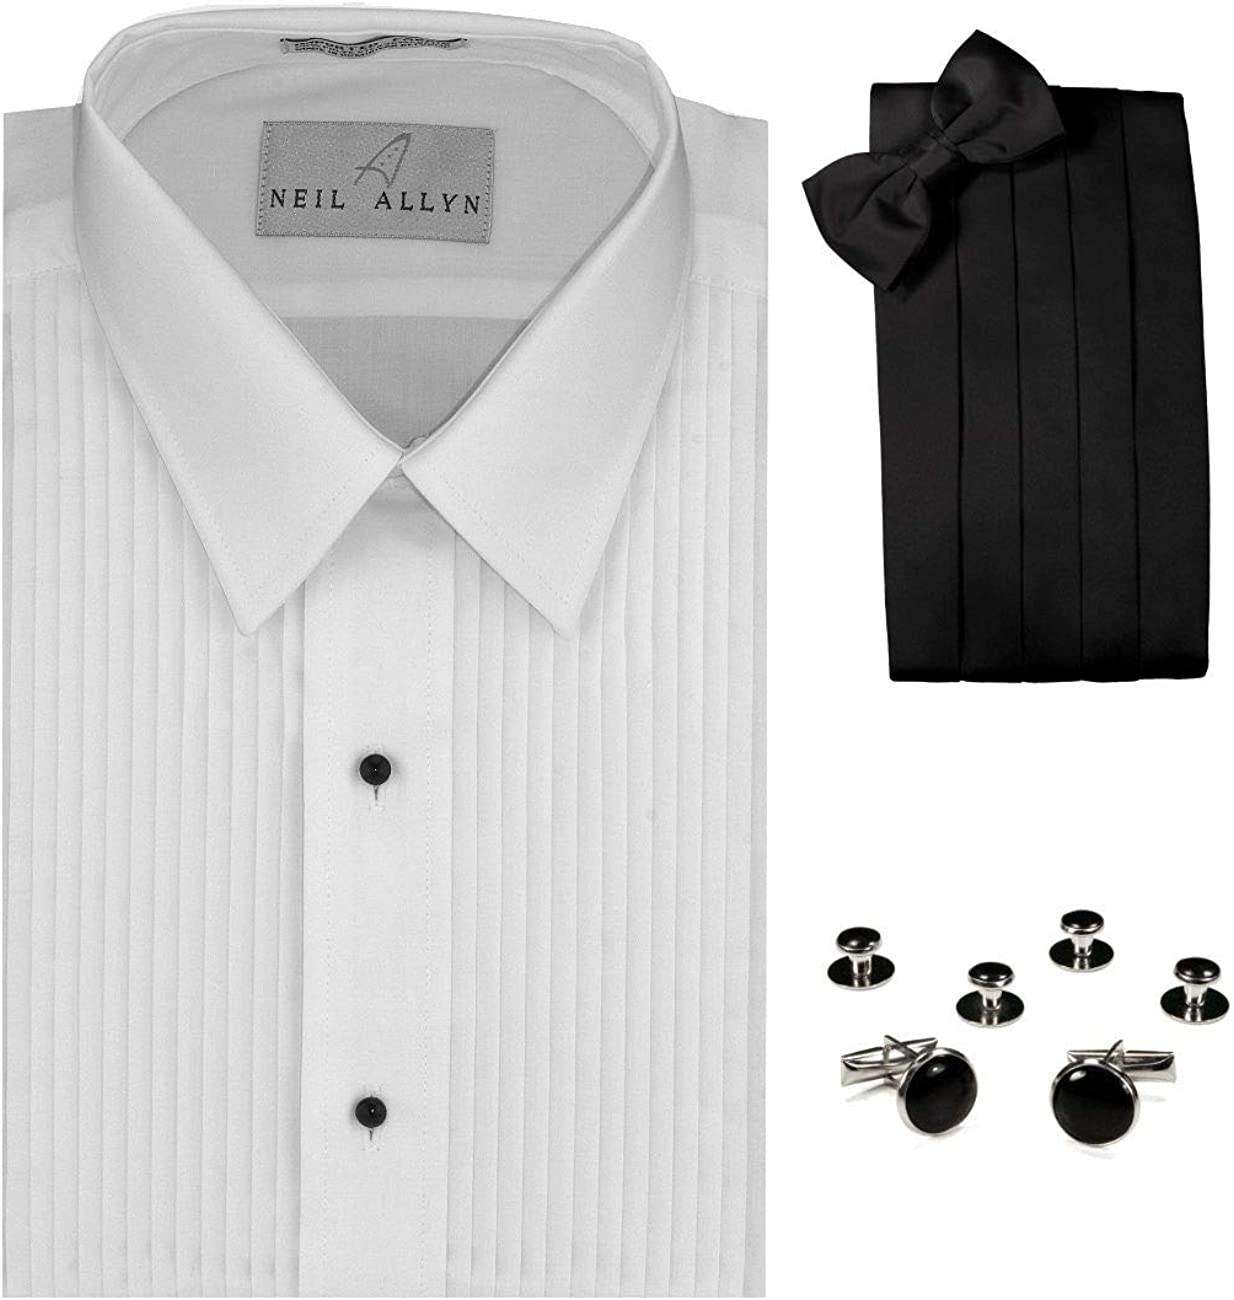 Blk//Silver trim  tuxedo cufflinks and studs Brand NEW